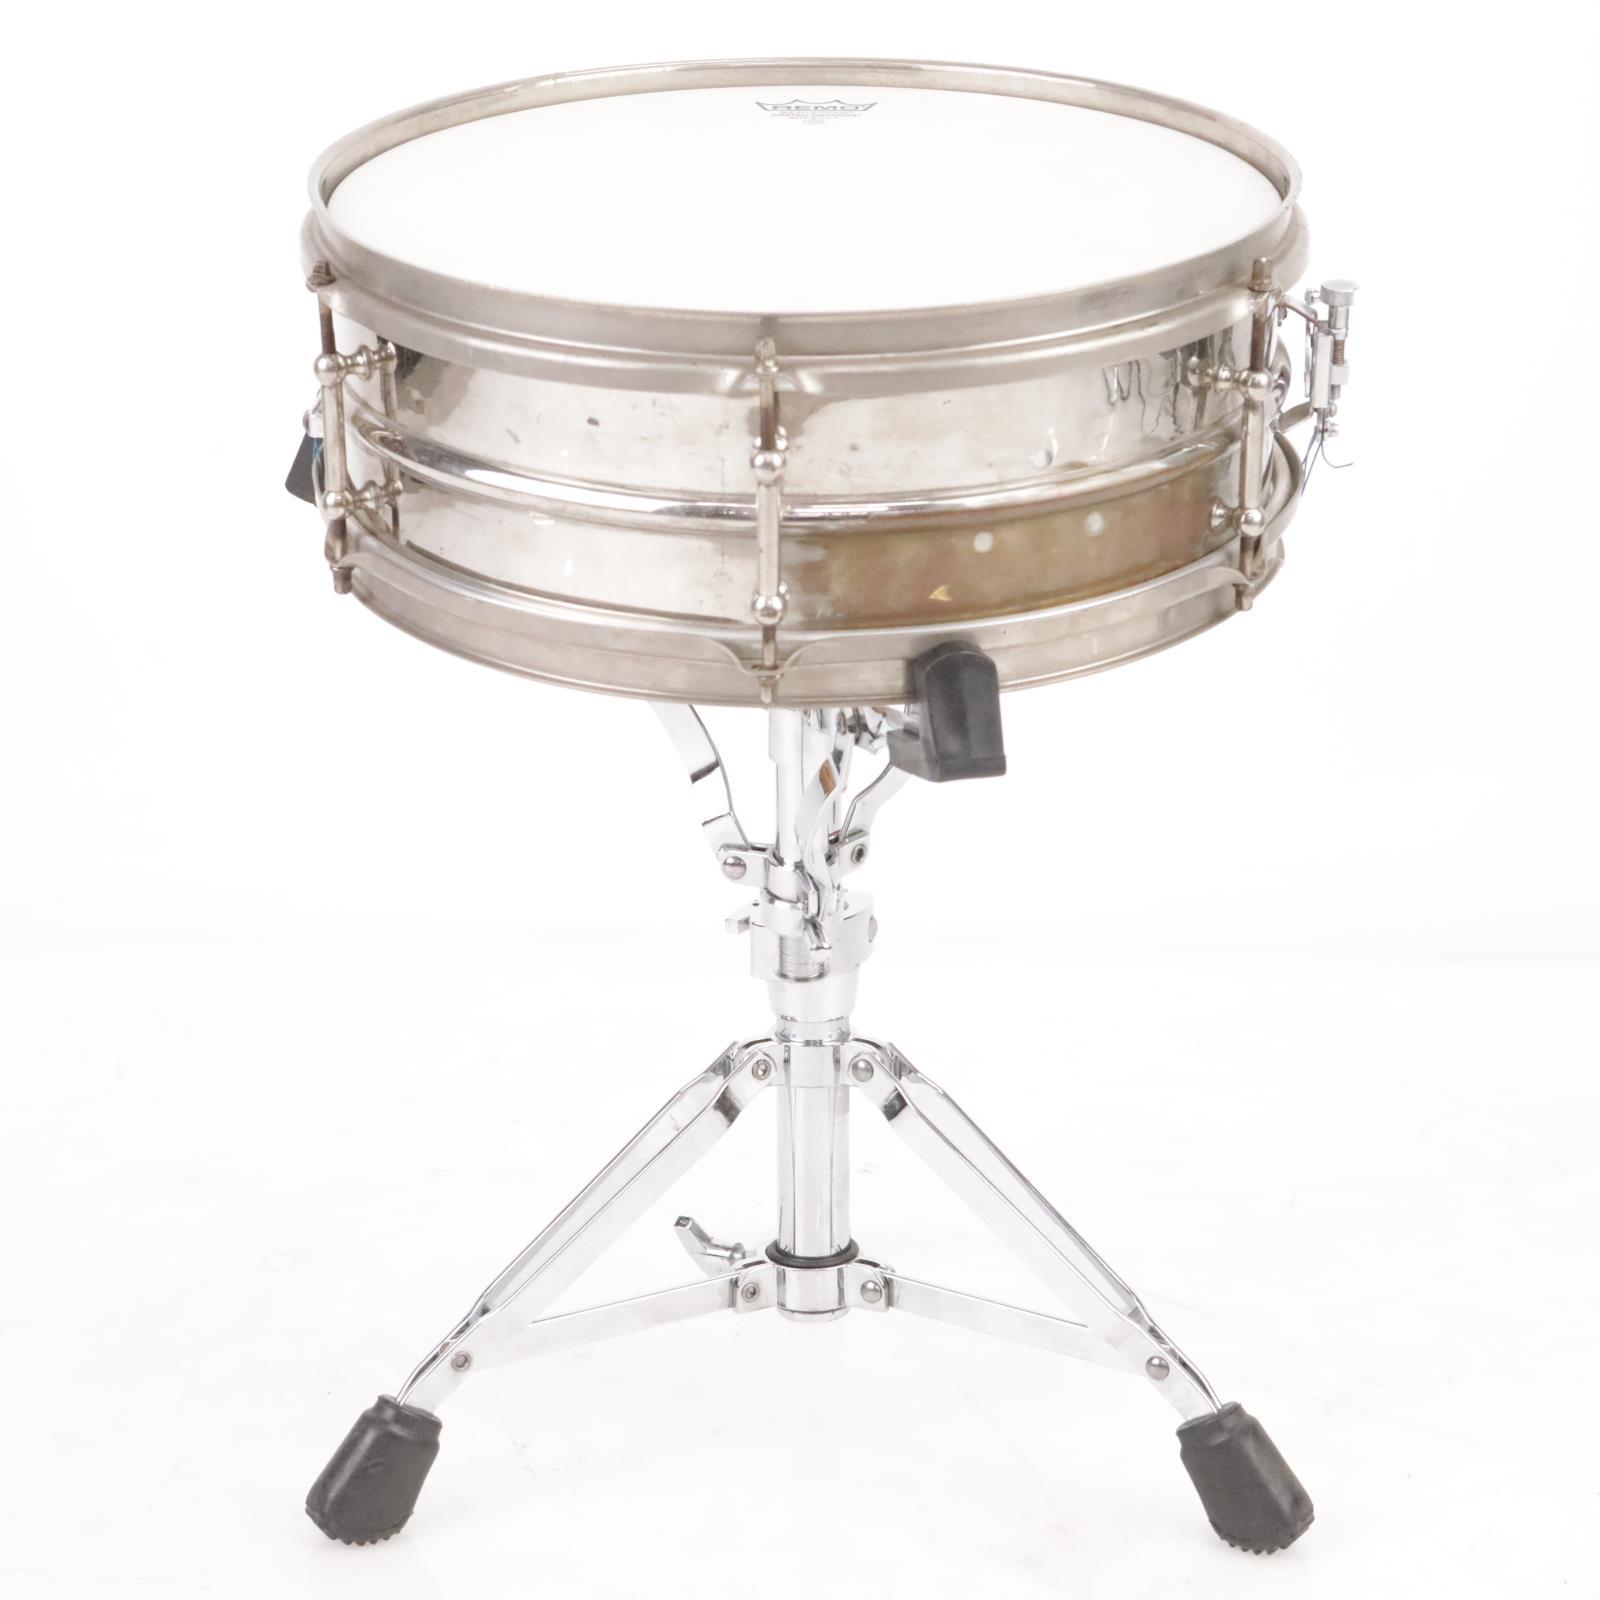 1920's Ludwig Super Ludwig 4.5 x 14 Metal Separate Tension Snare Drum #39524